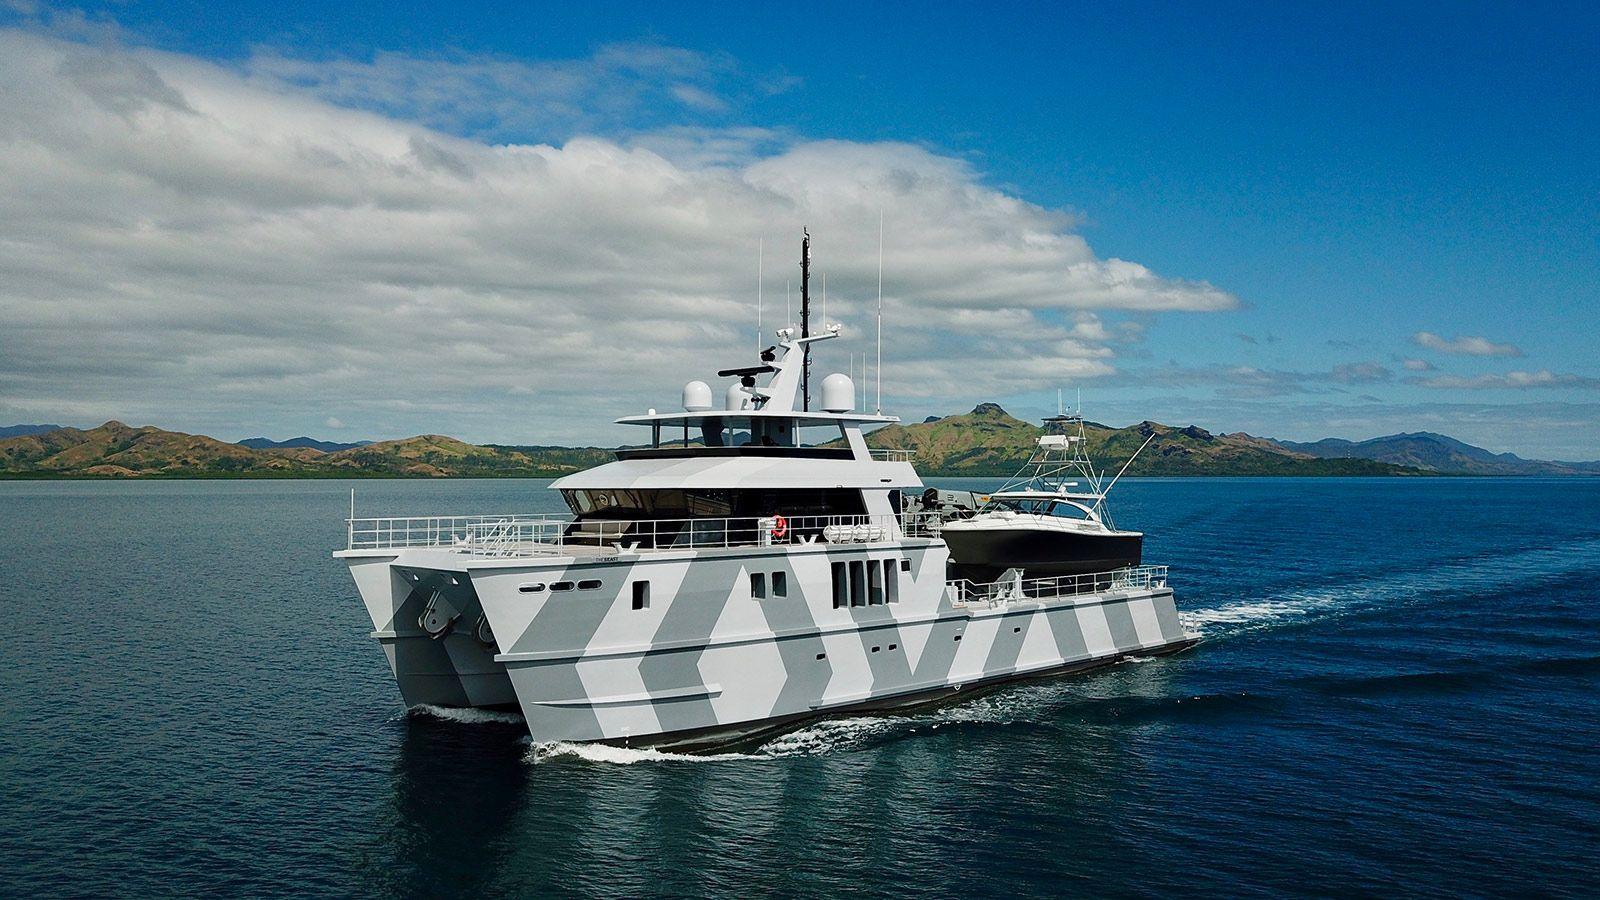 The Beast Superyacht: On Board the 39 Metre Explorer Catamaran | Boat International